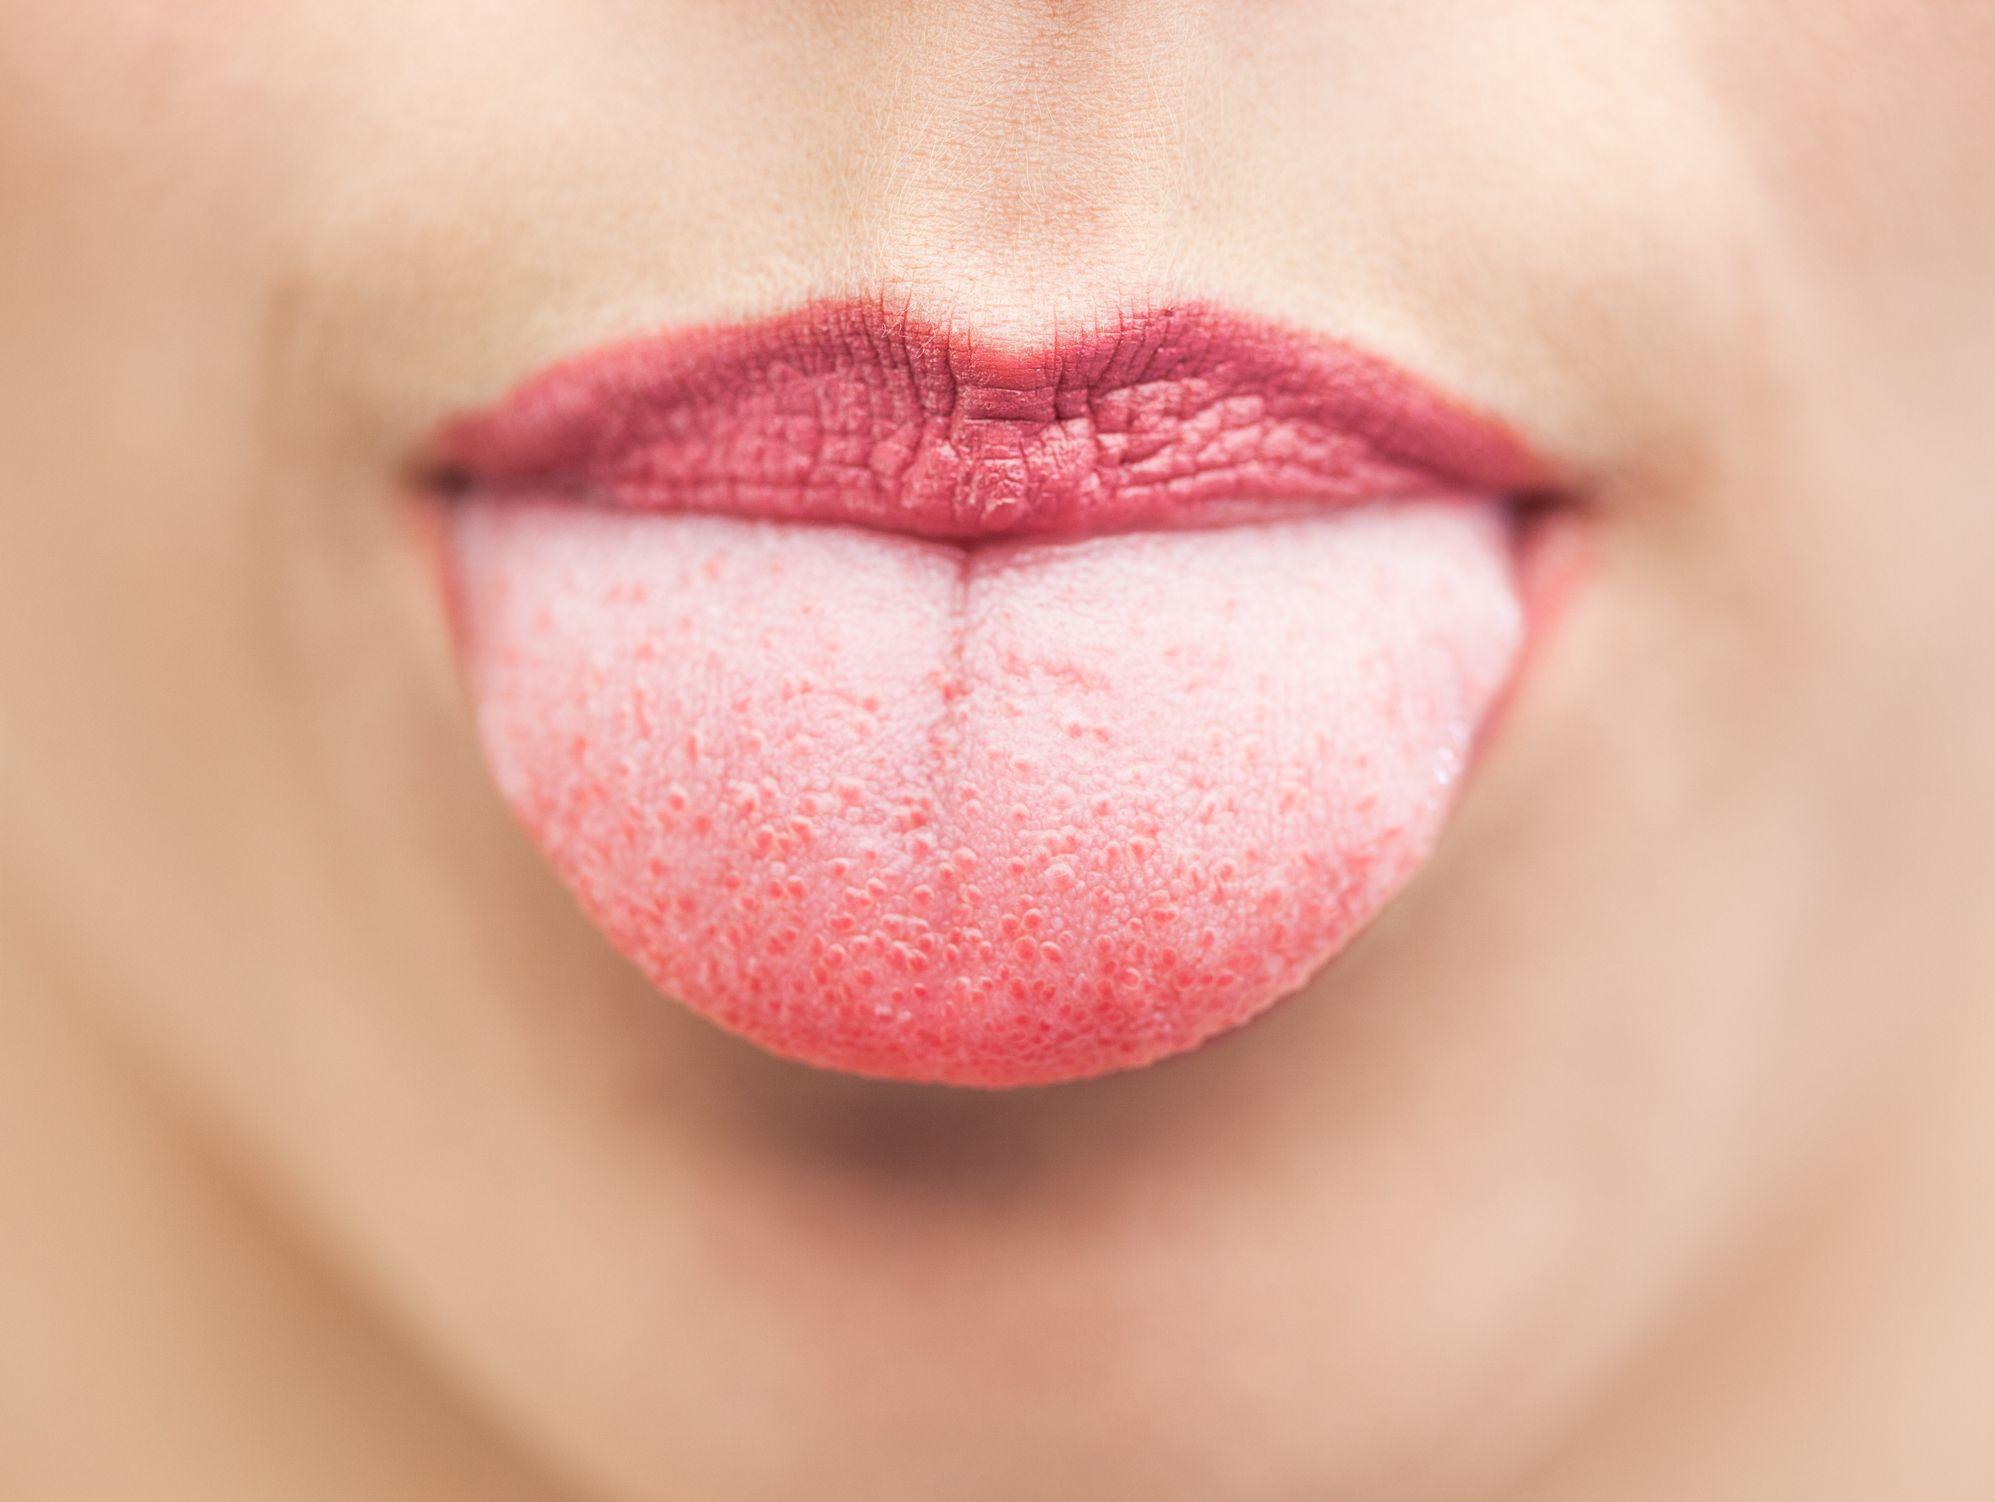 tongue papillae pain